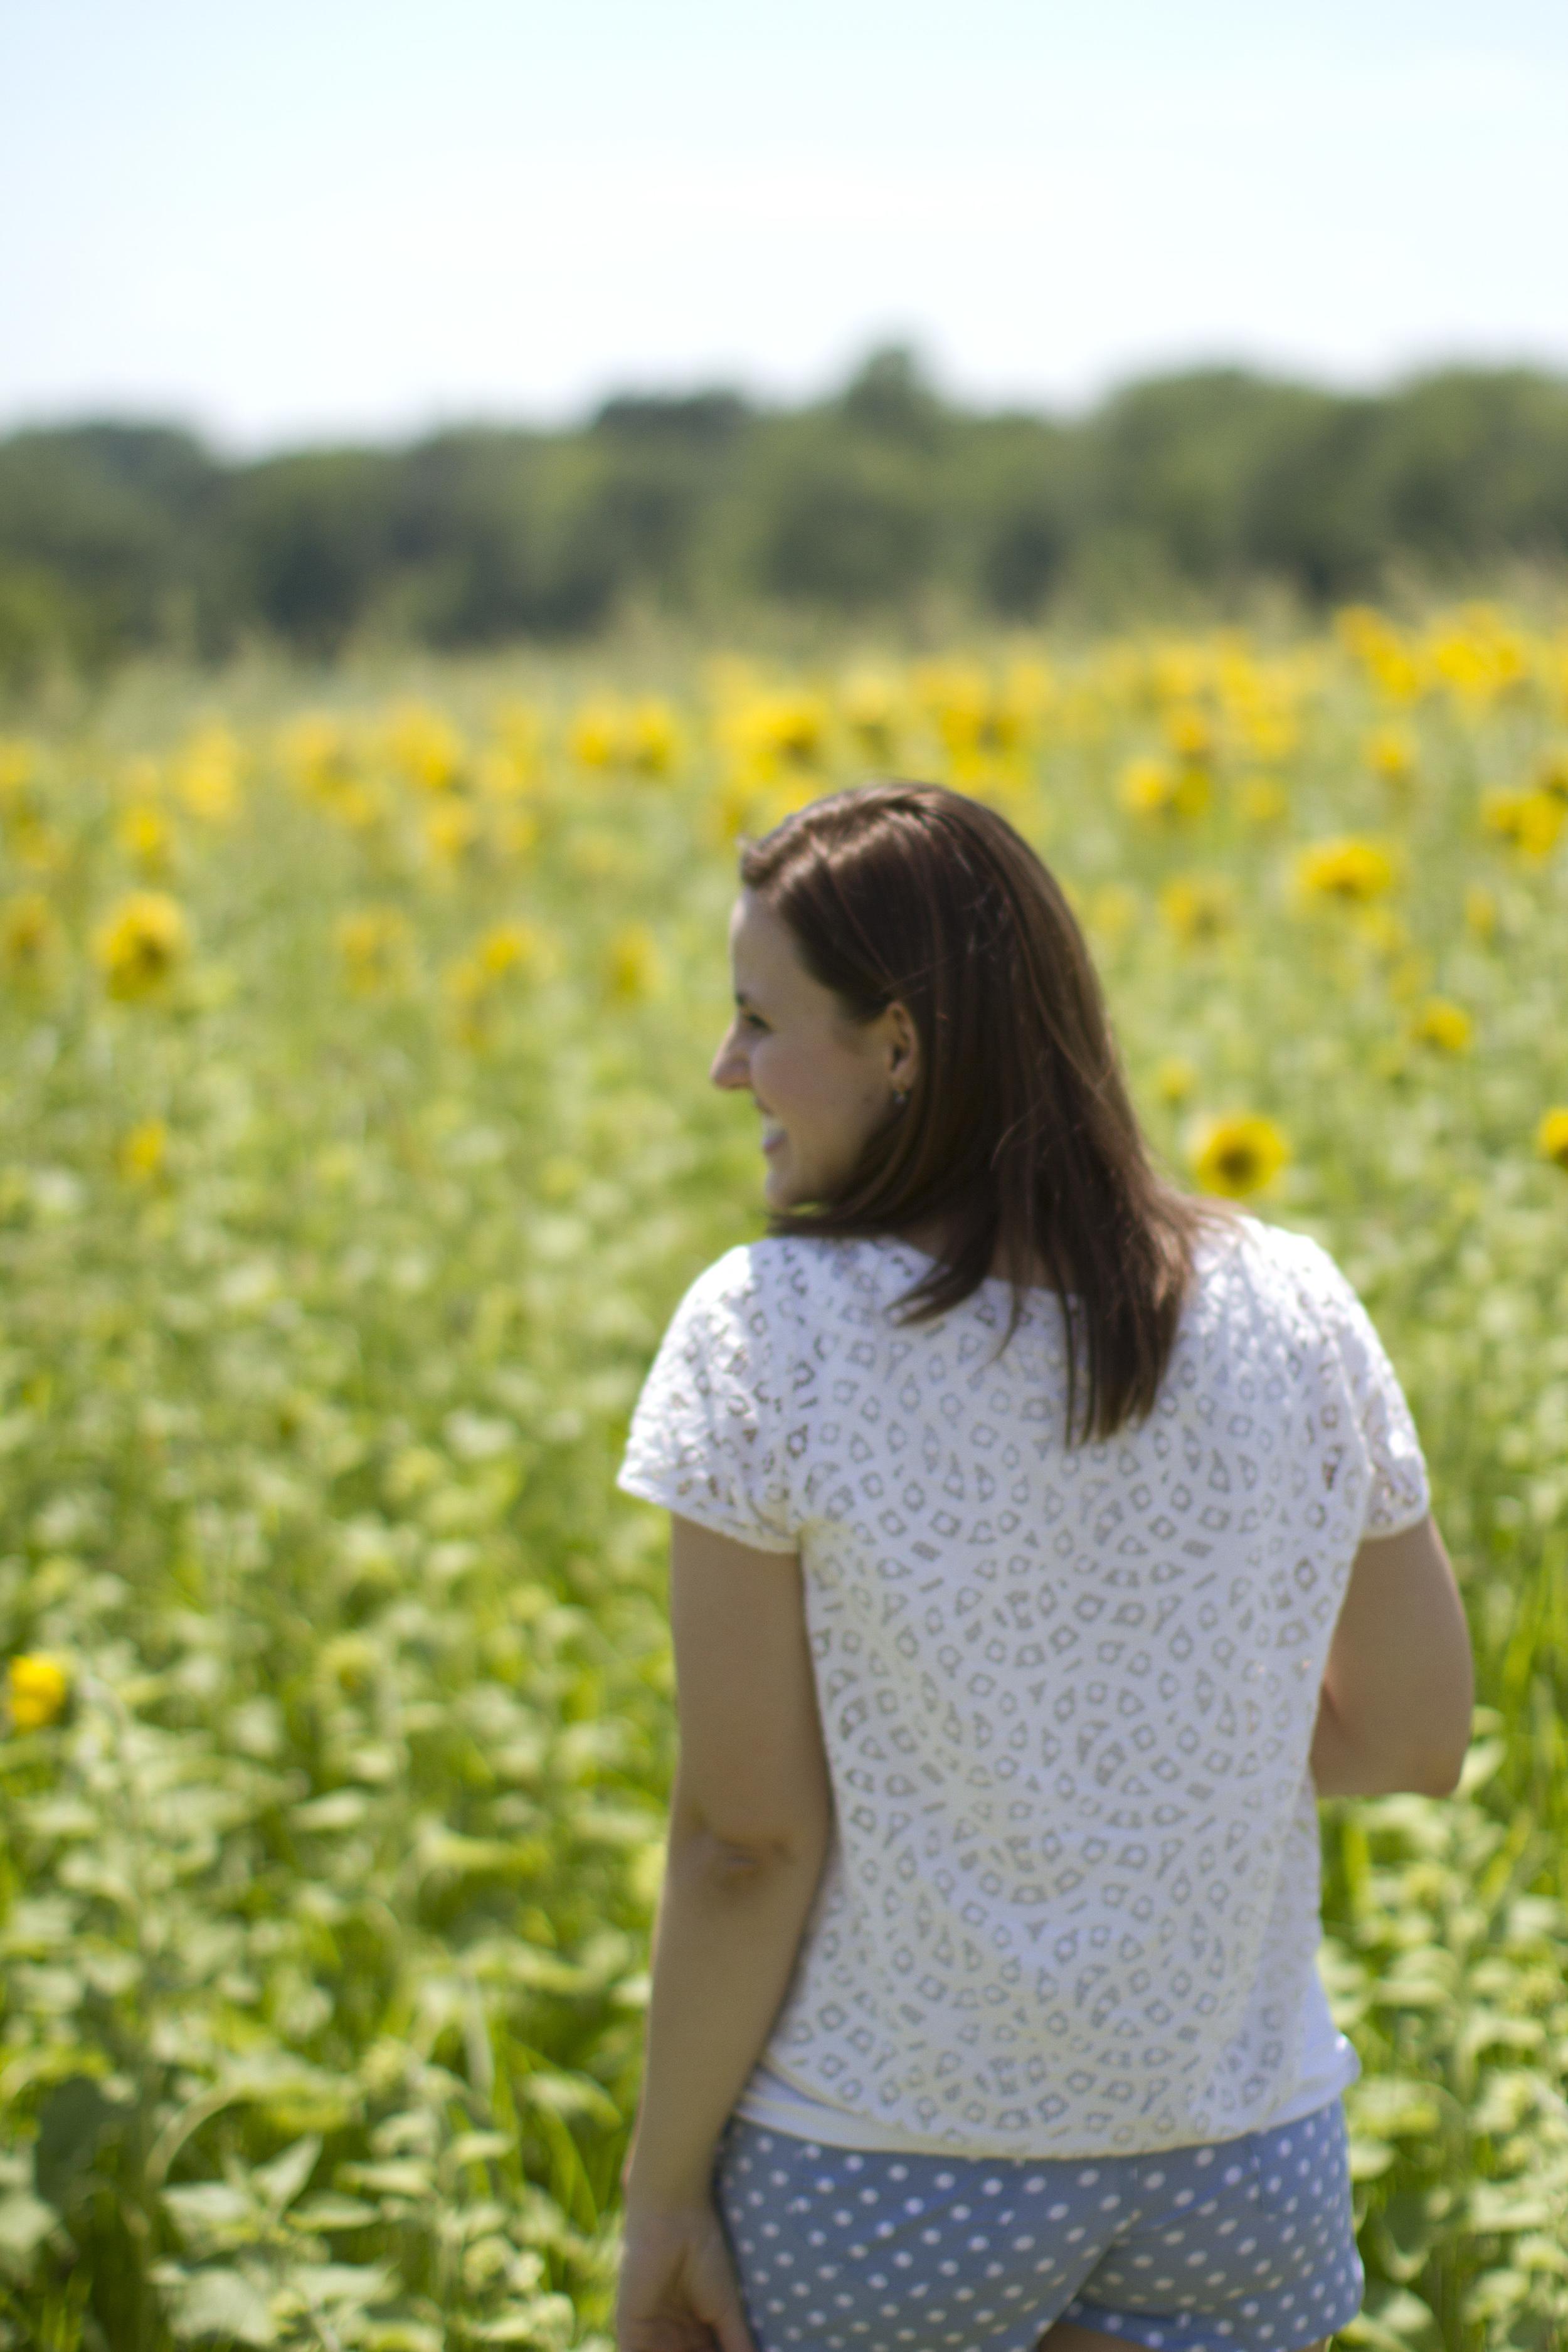 Sunflower-field-West-Chester-Ohio